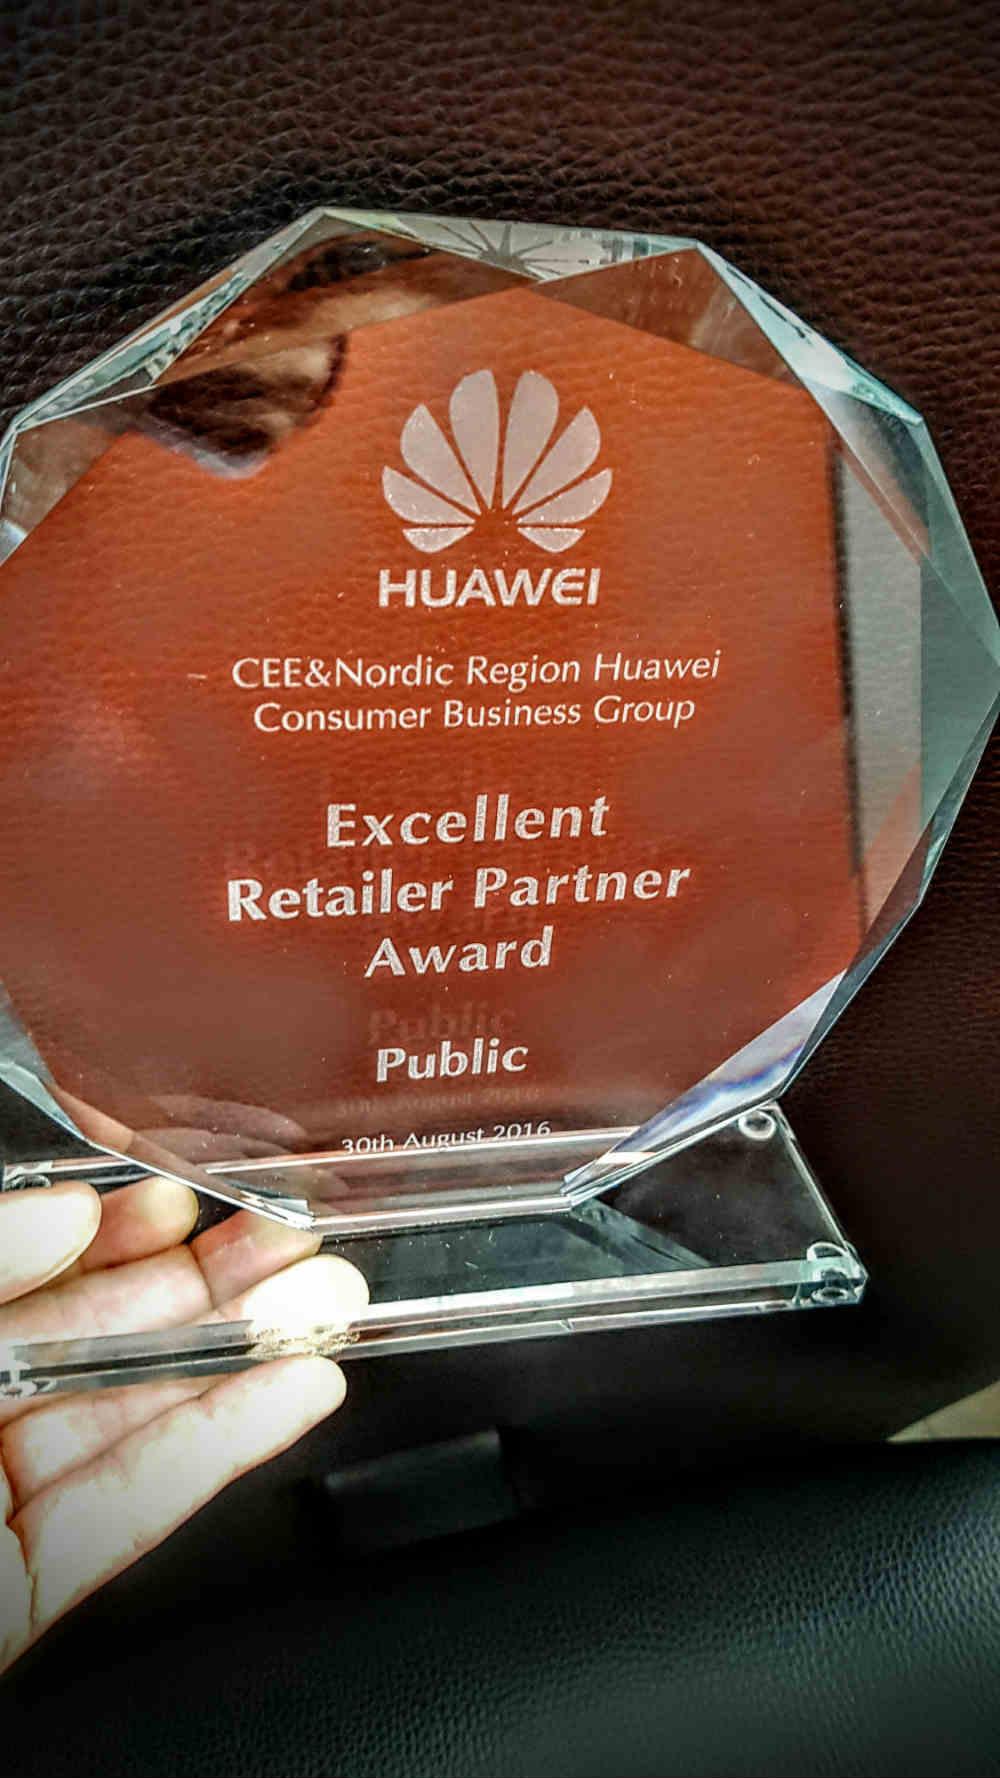 public - award